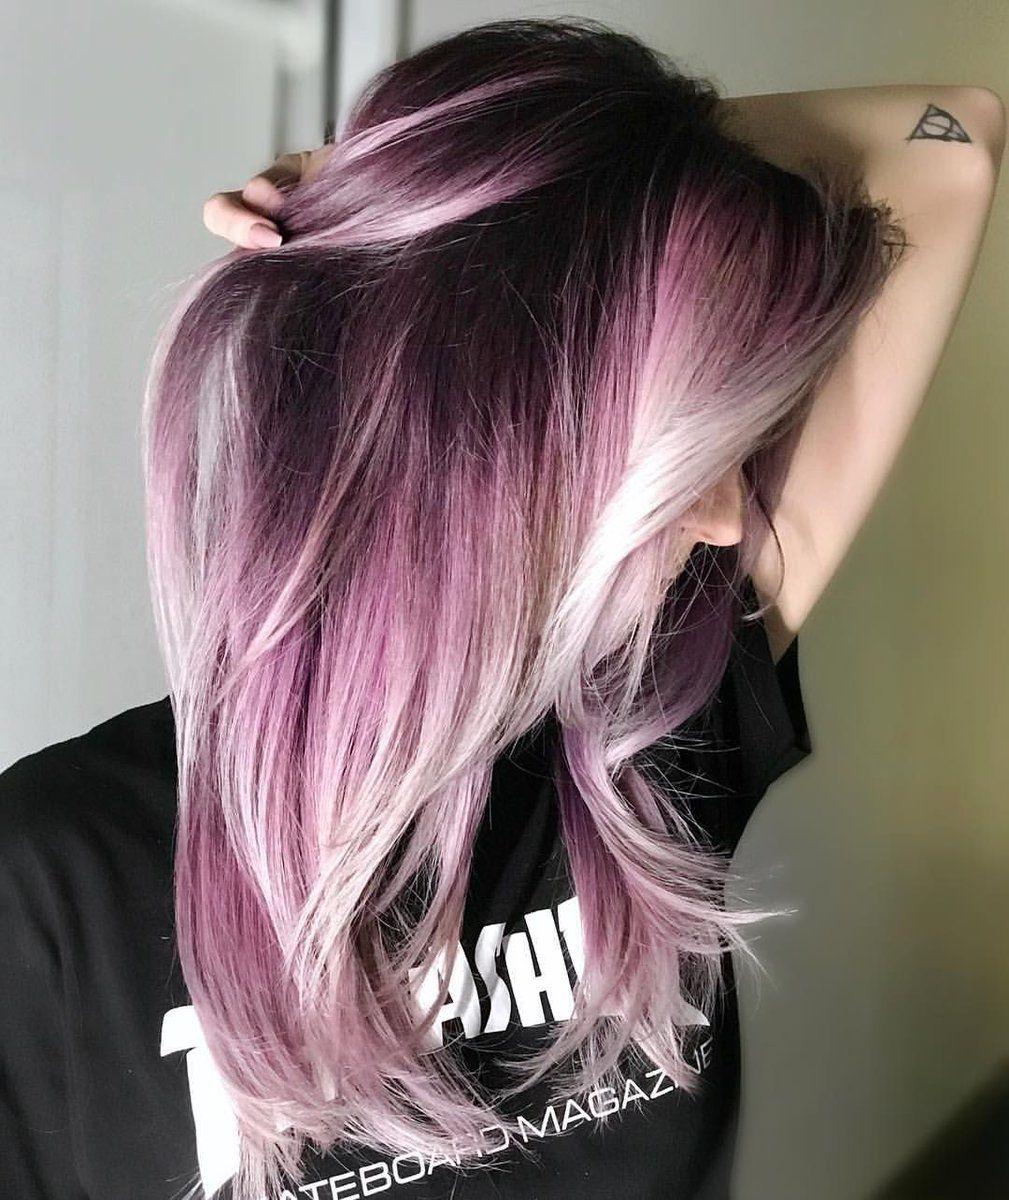 Pin by jen harrelson on beauty pinterest hair coloring hair